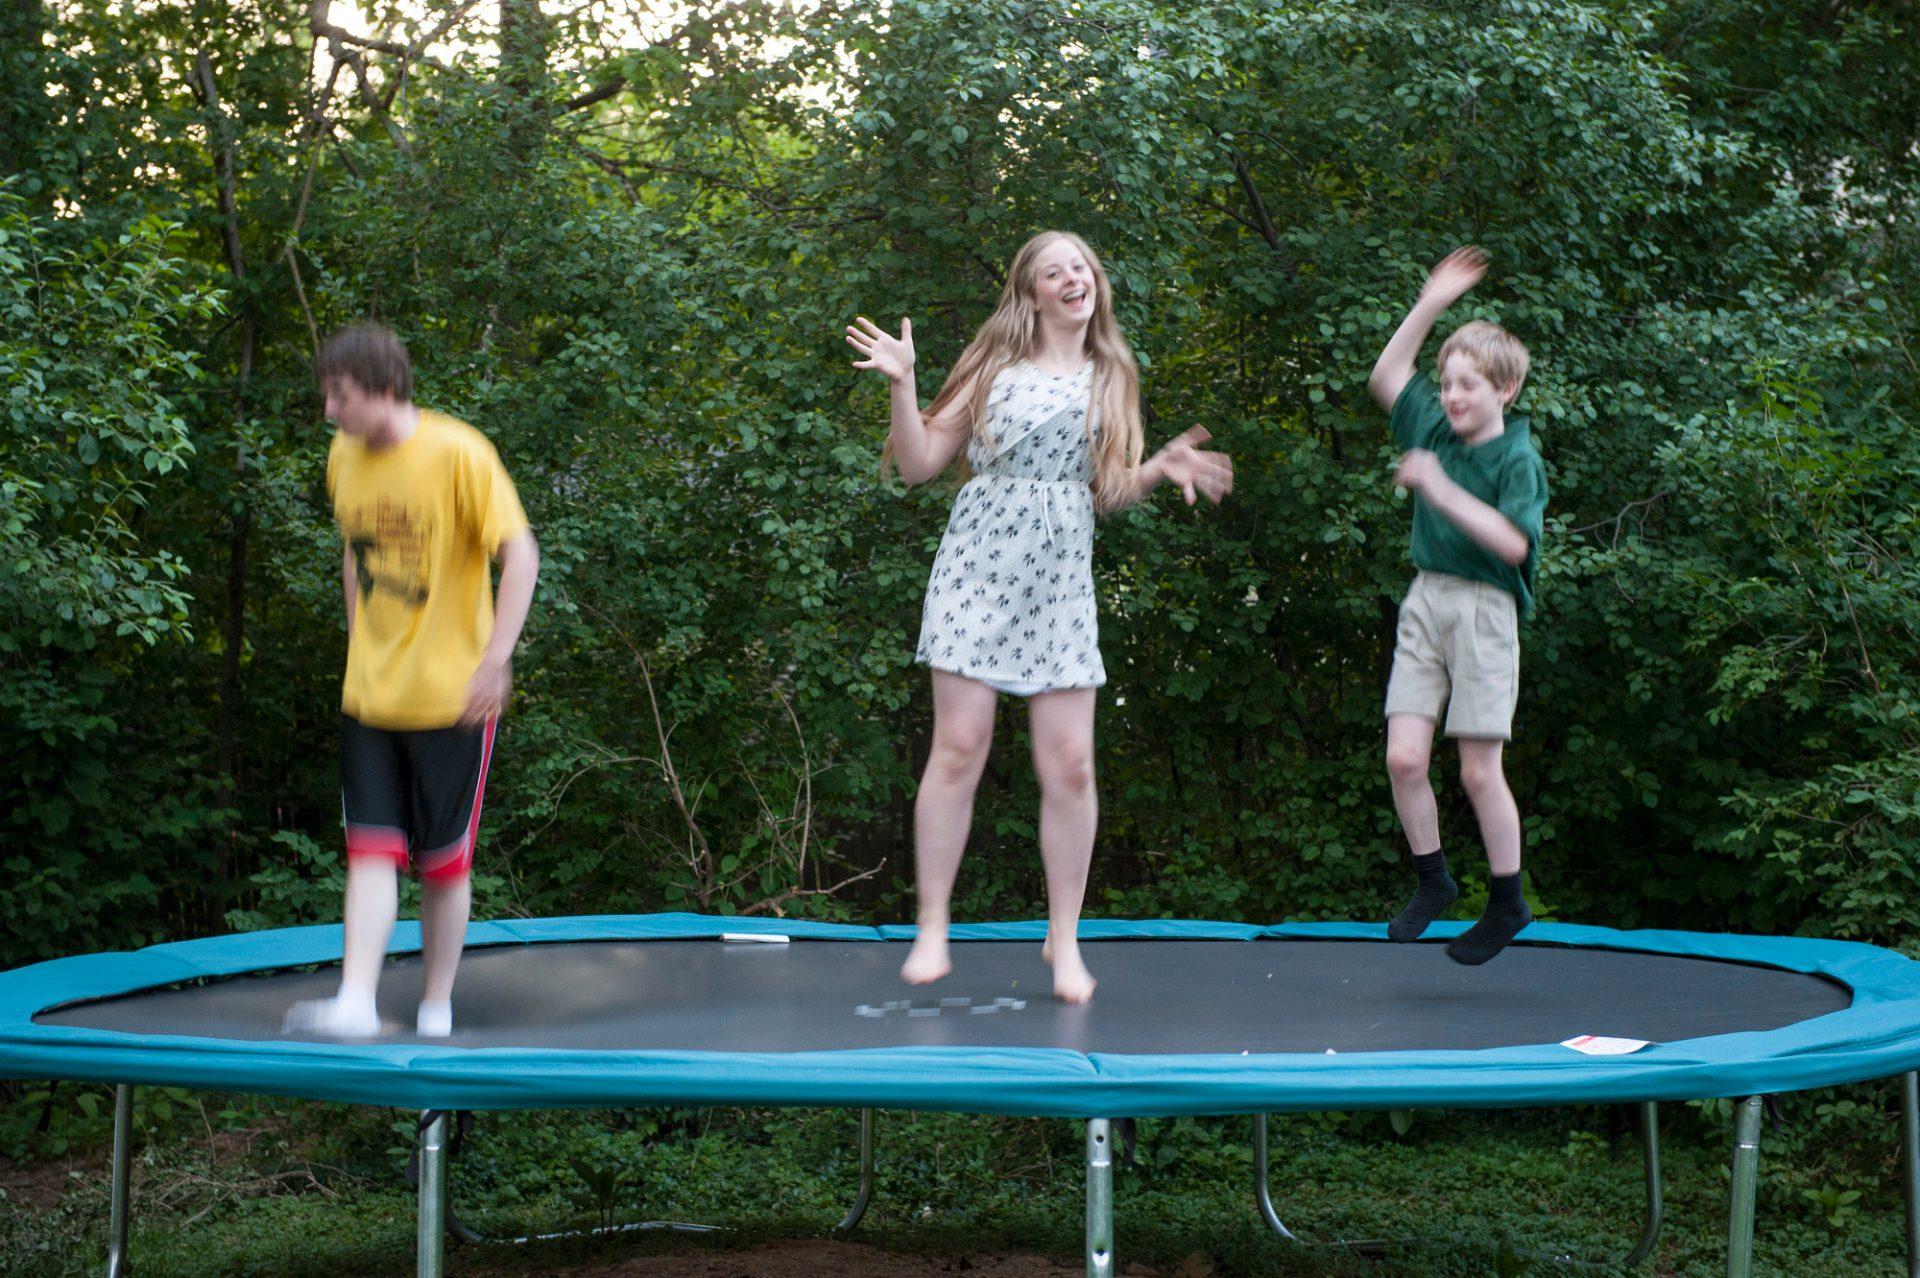 Photo: Three siblings jump on a trampoline in Lincoln, Nebraska.